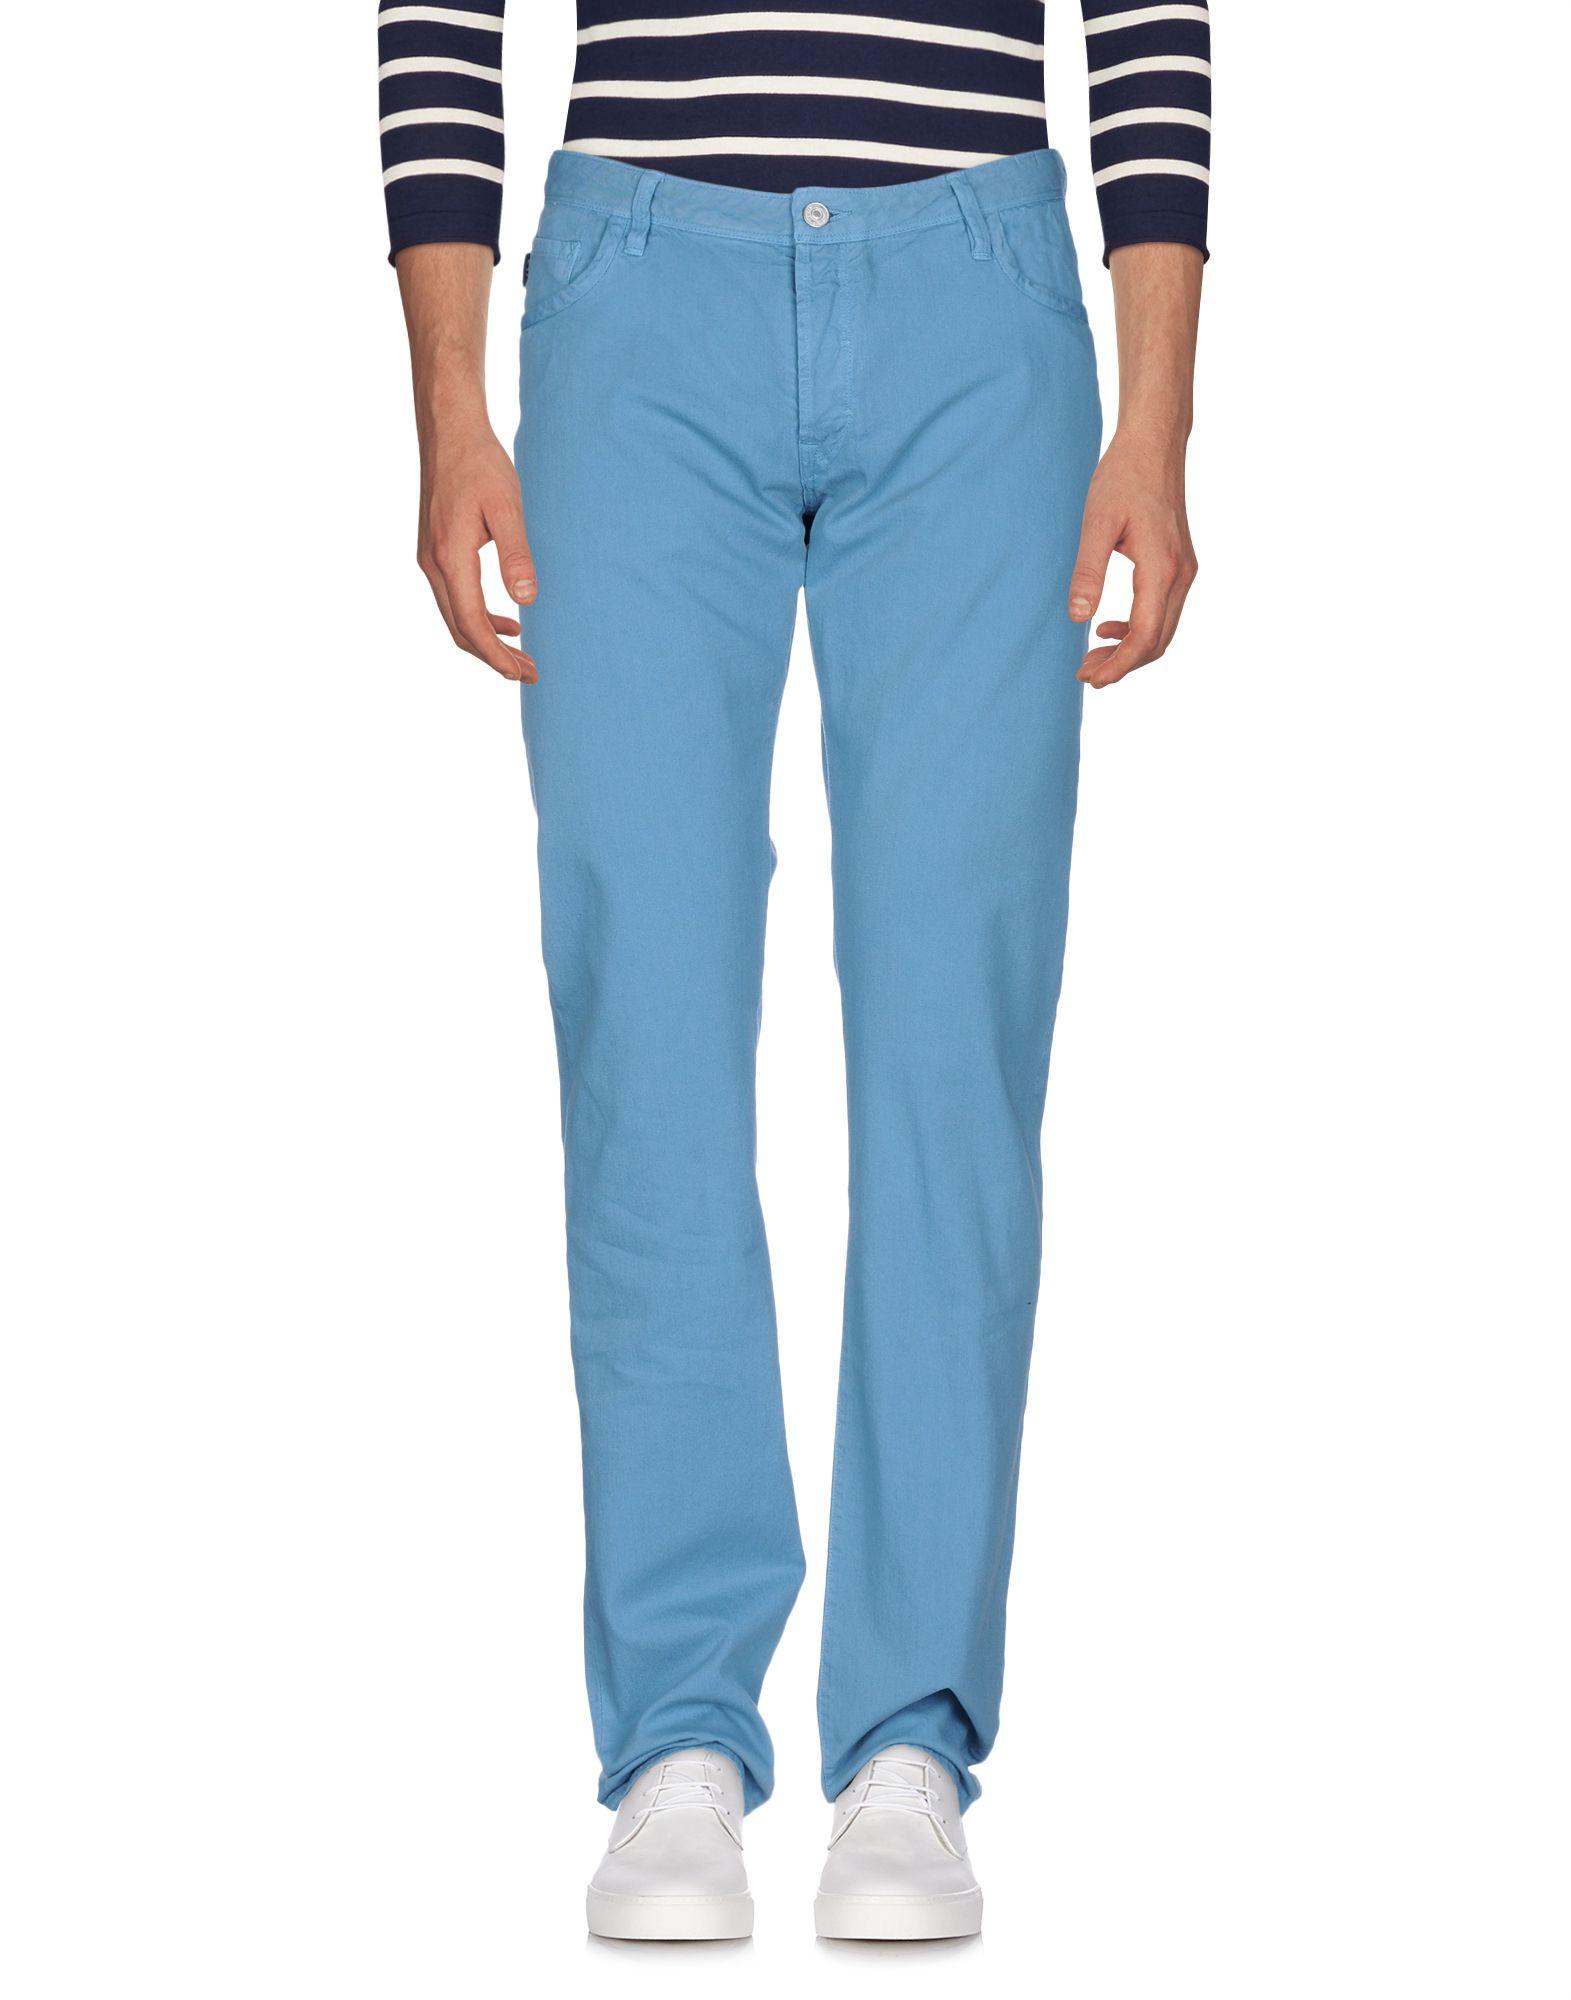 Pantaloni Jeans Paul Smith Uomo - Acquista online su